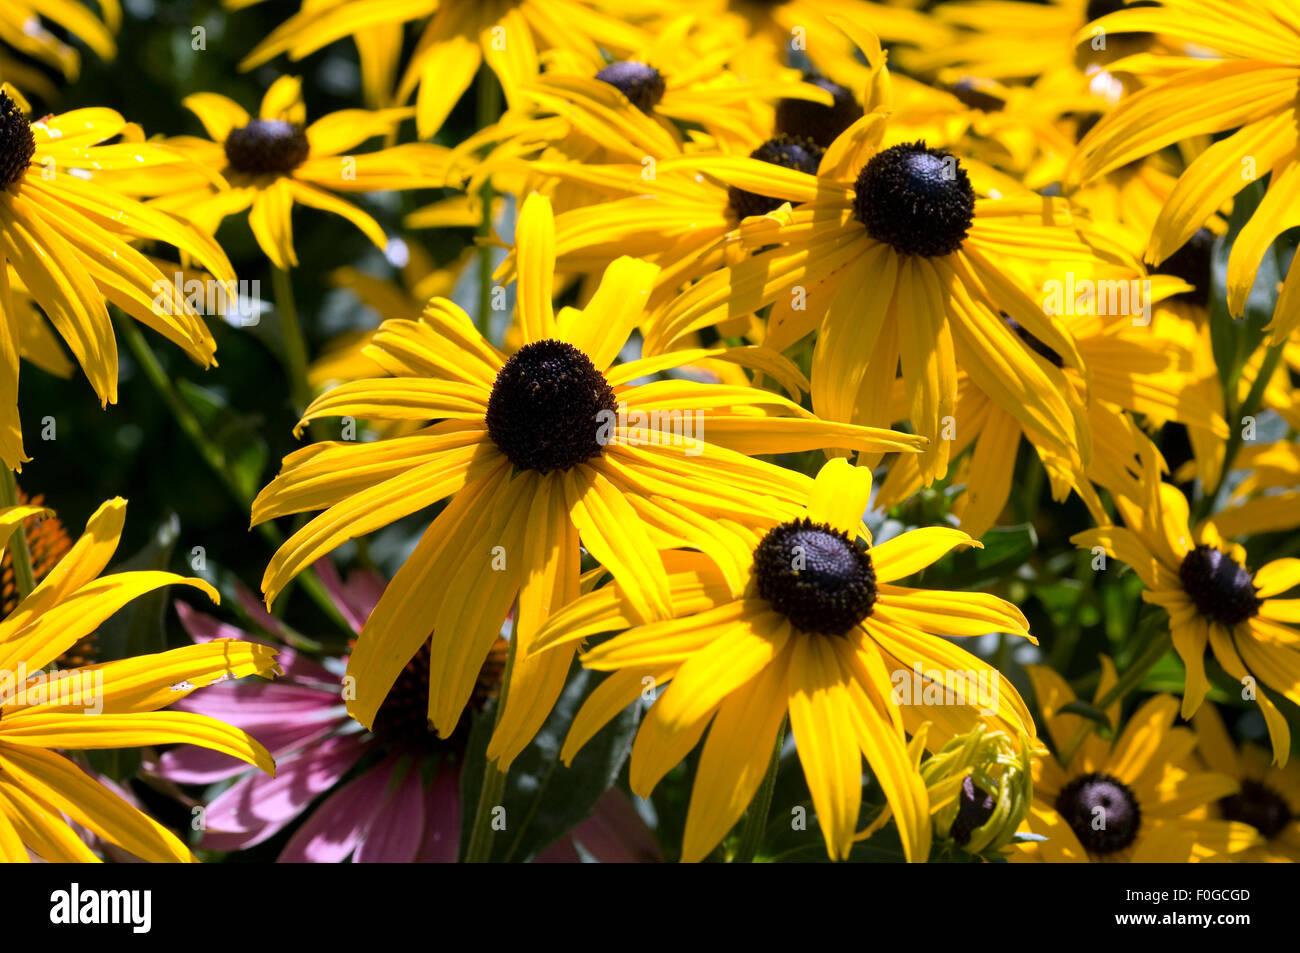 Sonnenhut, Rudbeckia hirta, - Stock Image